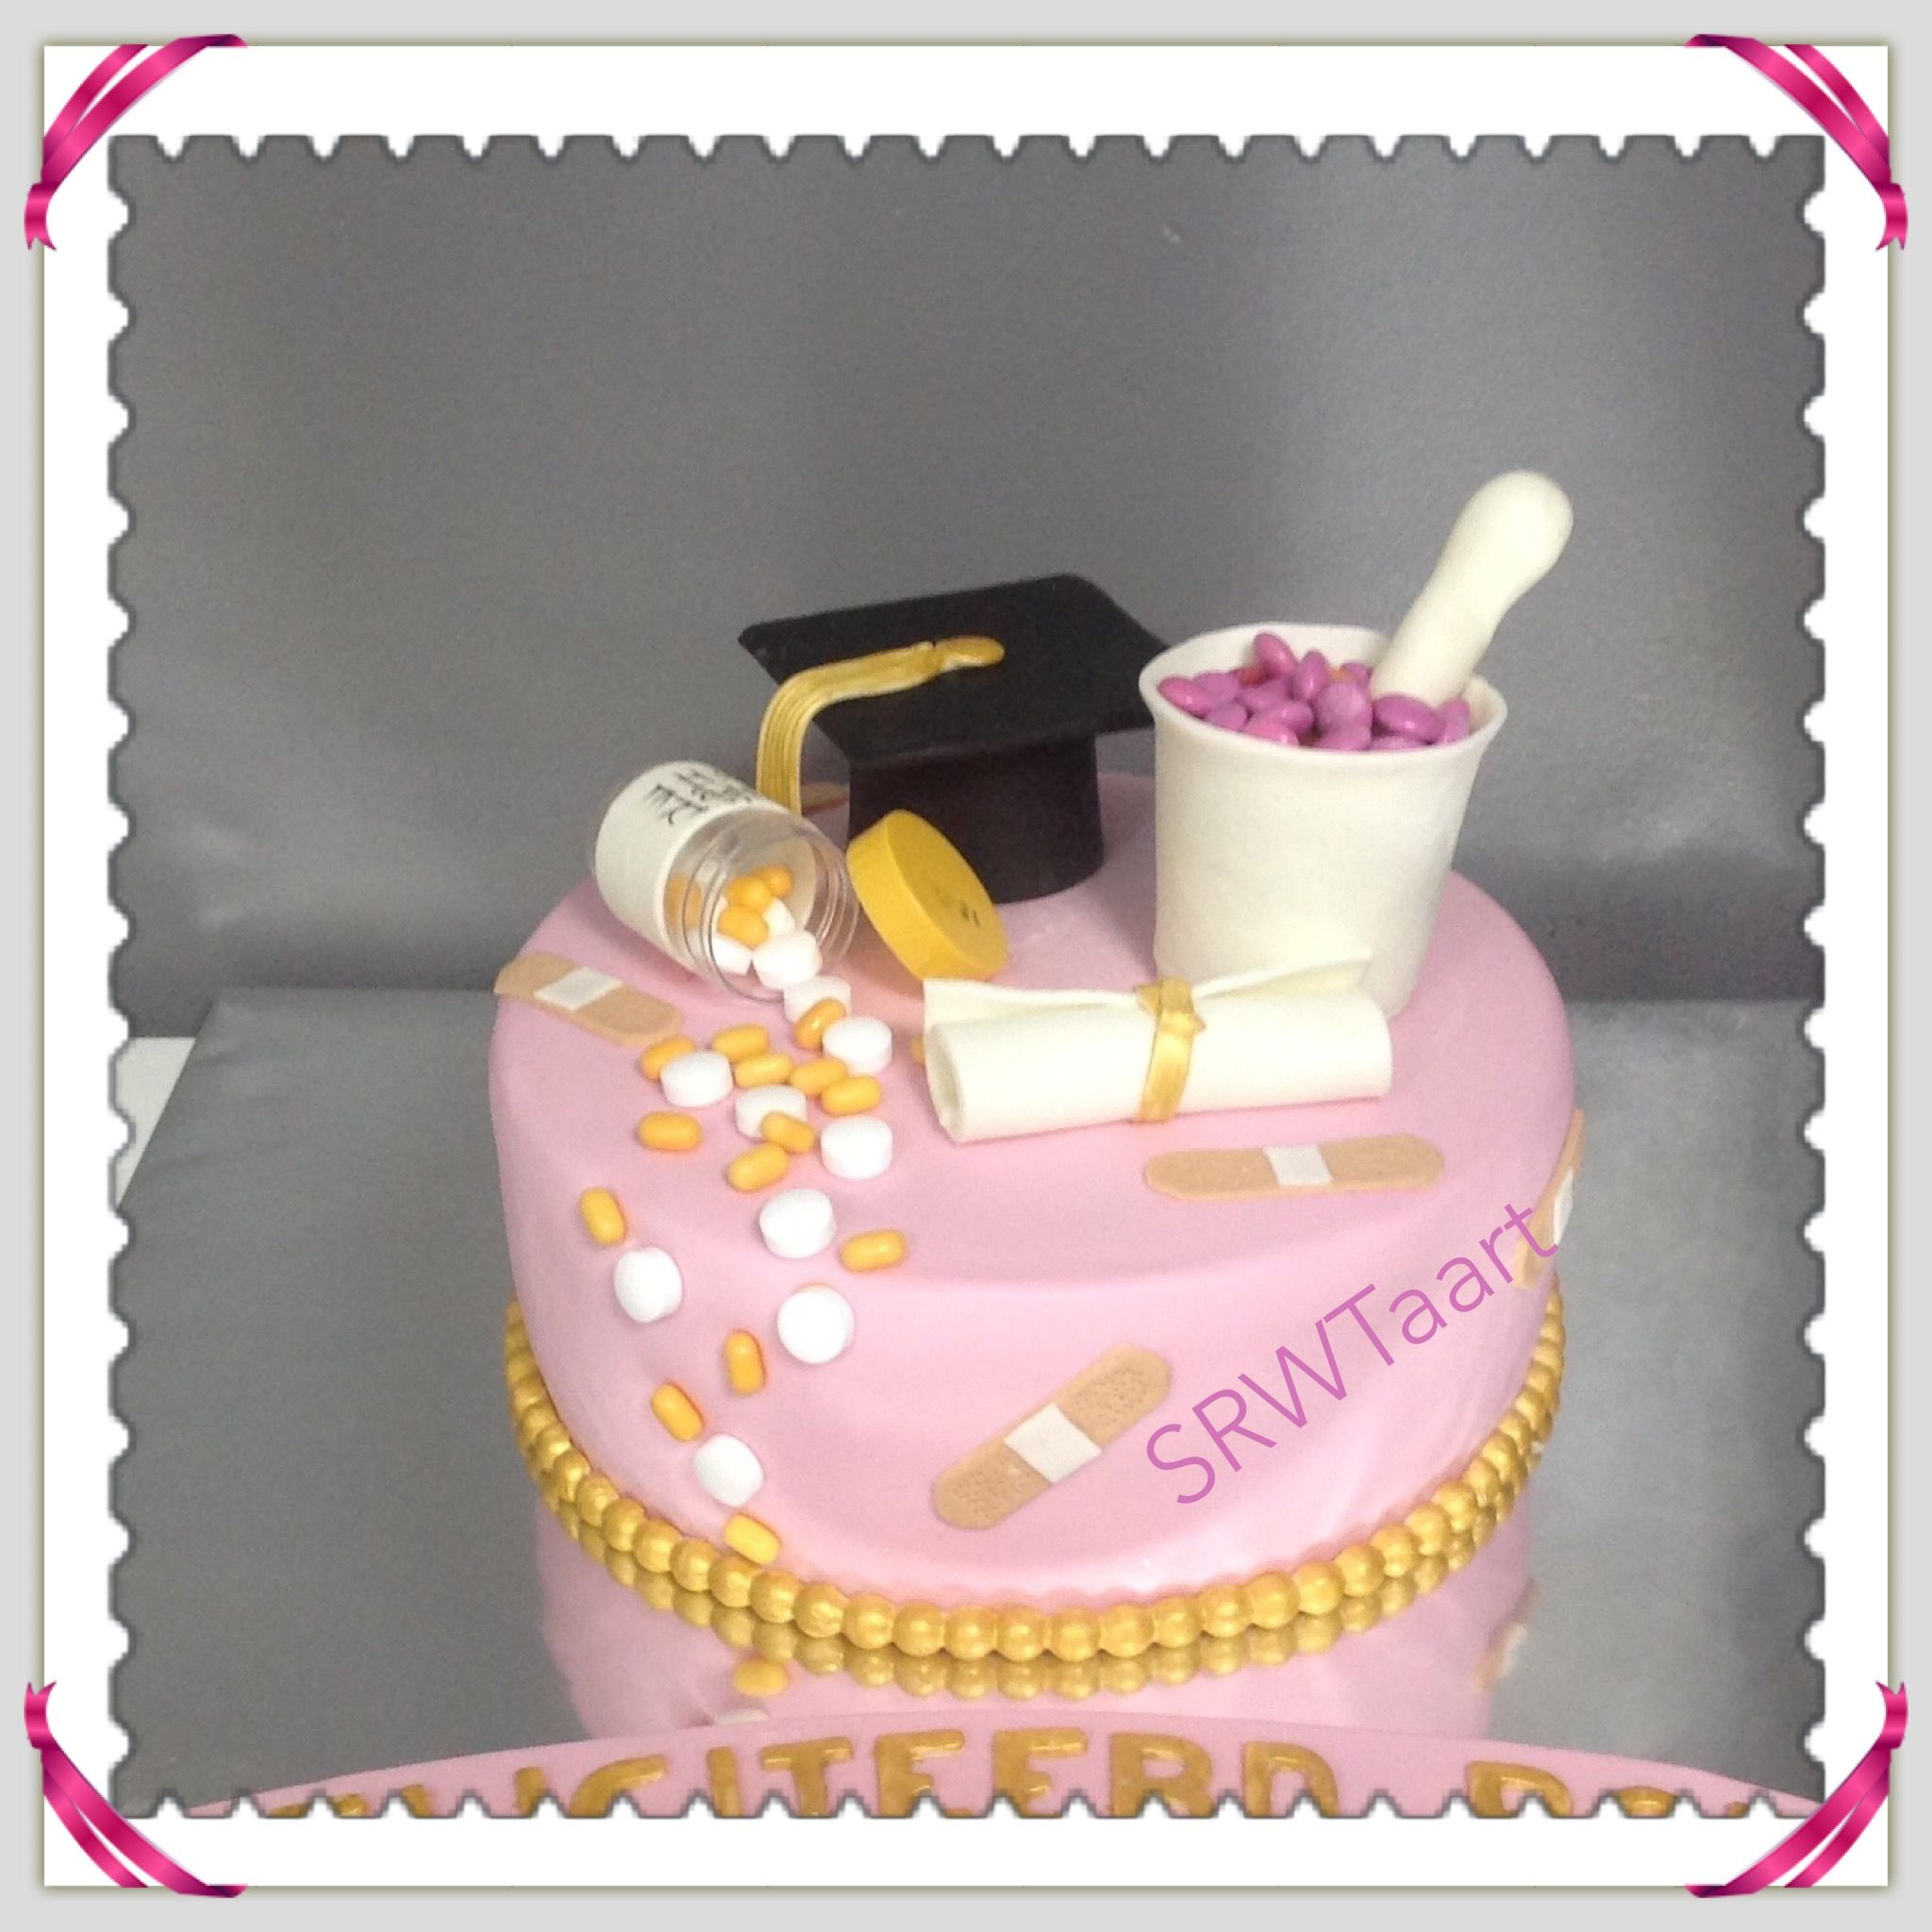 taart afgestudeerd Afgestudeerd taart 💕💕 | Srw Taart | Pinterest taart afgestudeerd